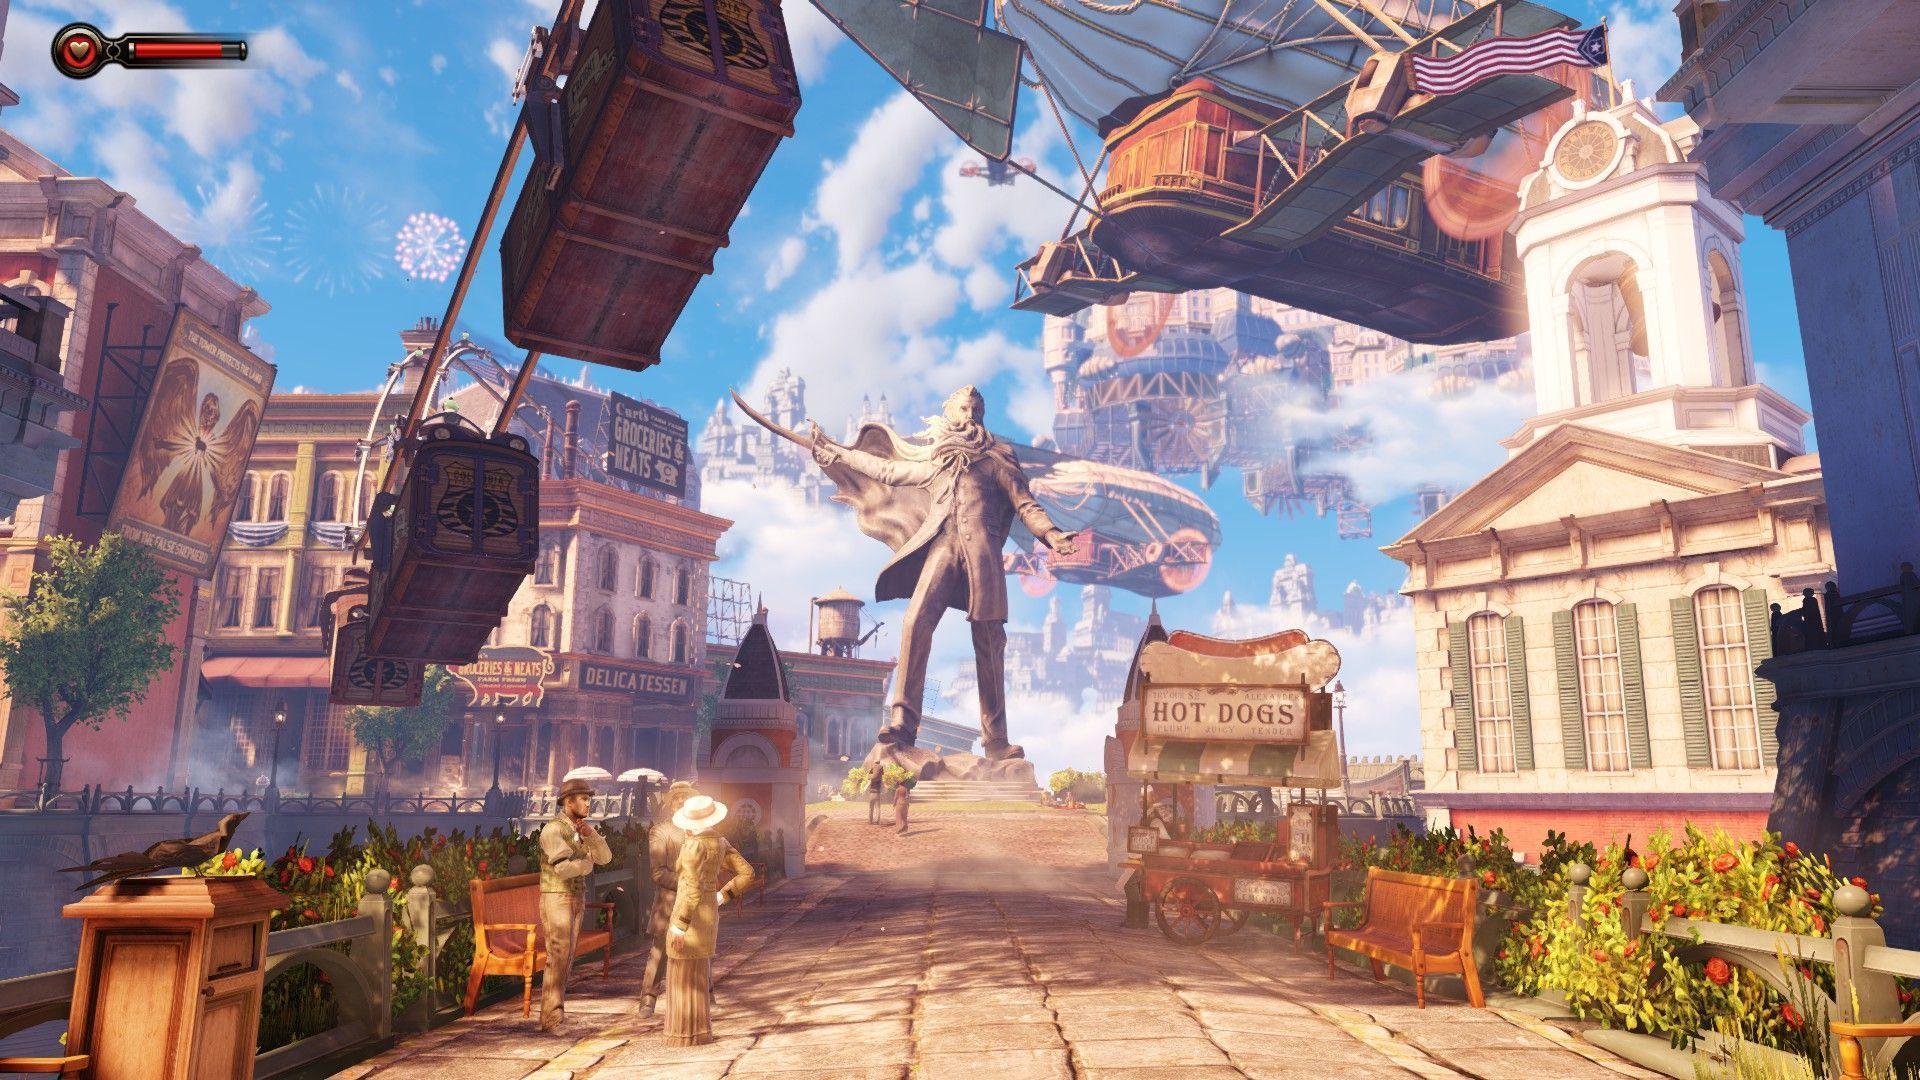 BioShock Infinite Backgrounds - Wallpaper Cave